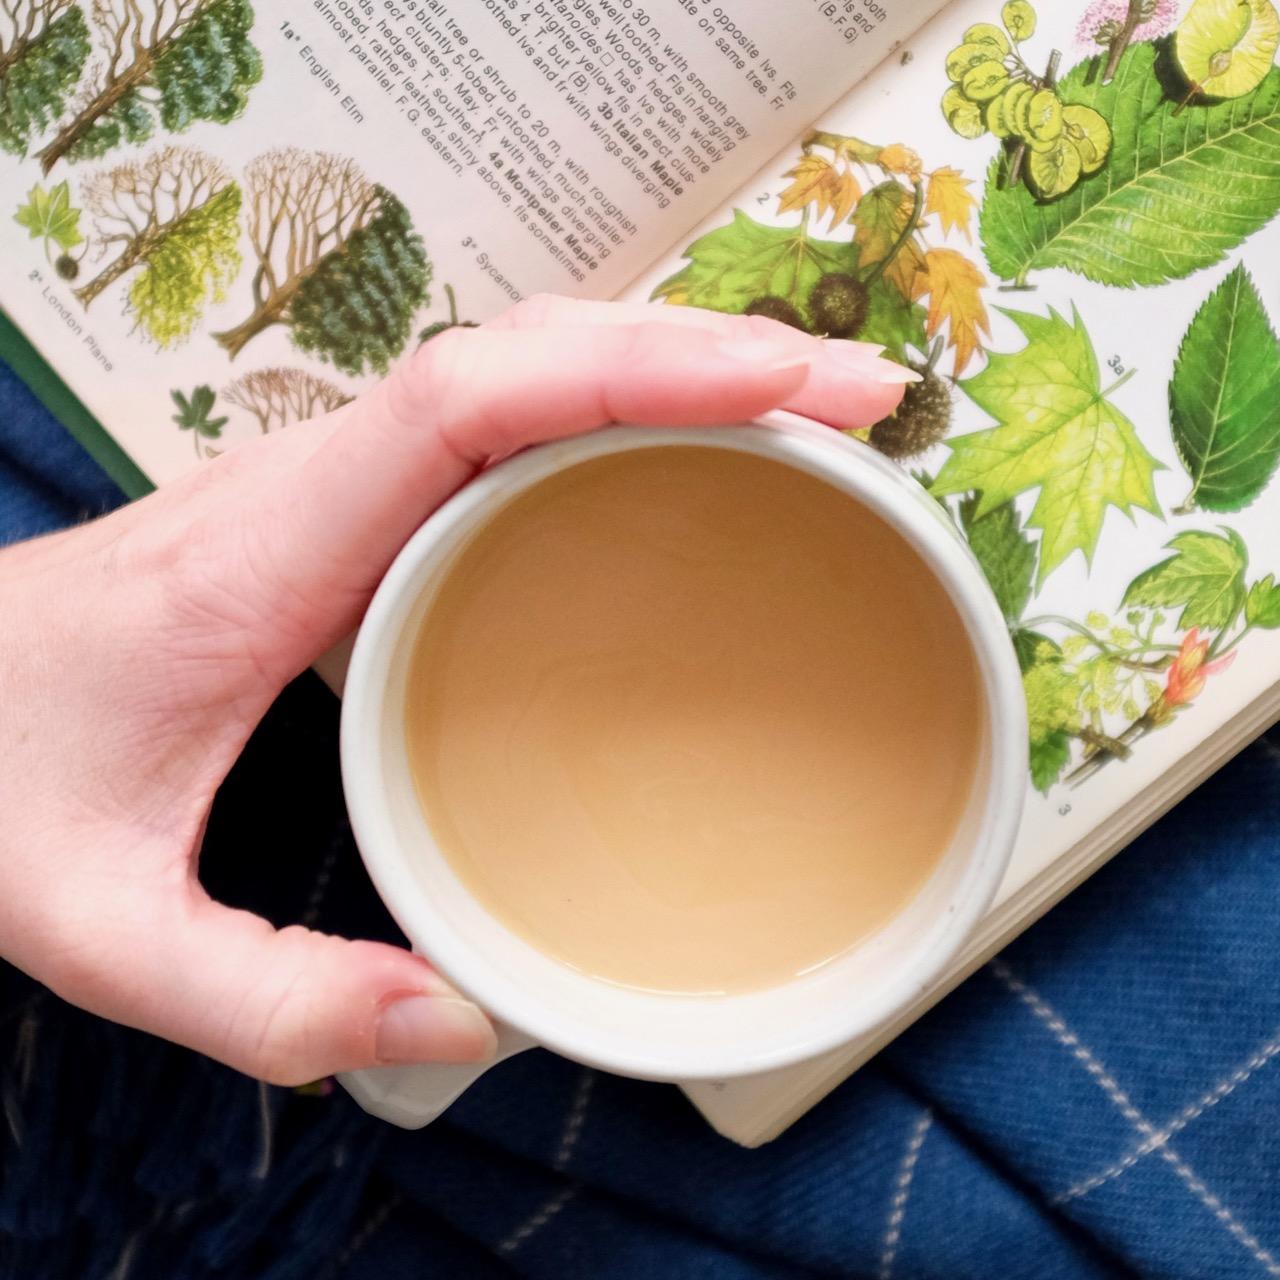 Tea and an autumn book